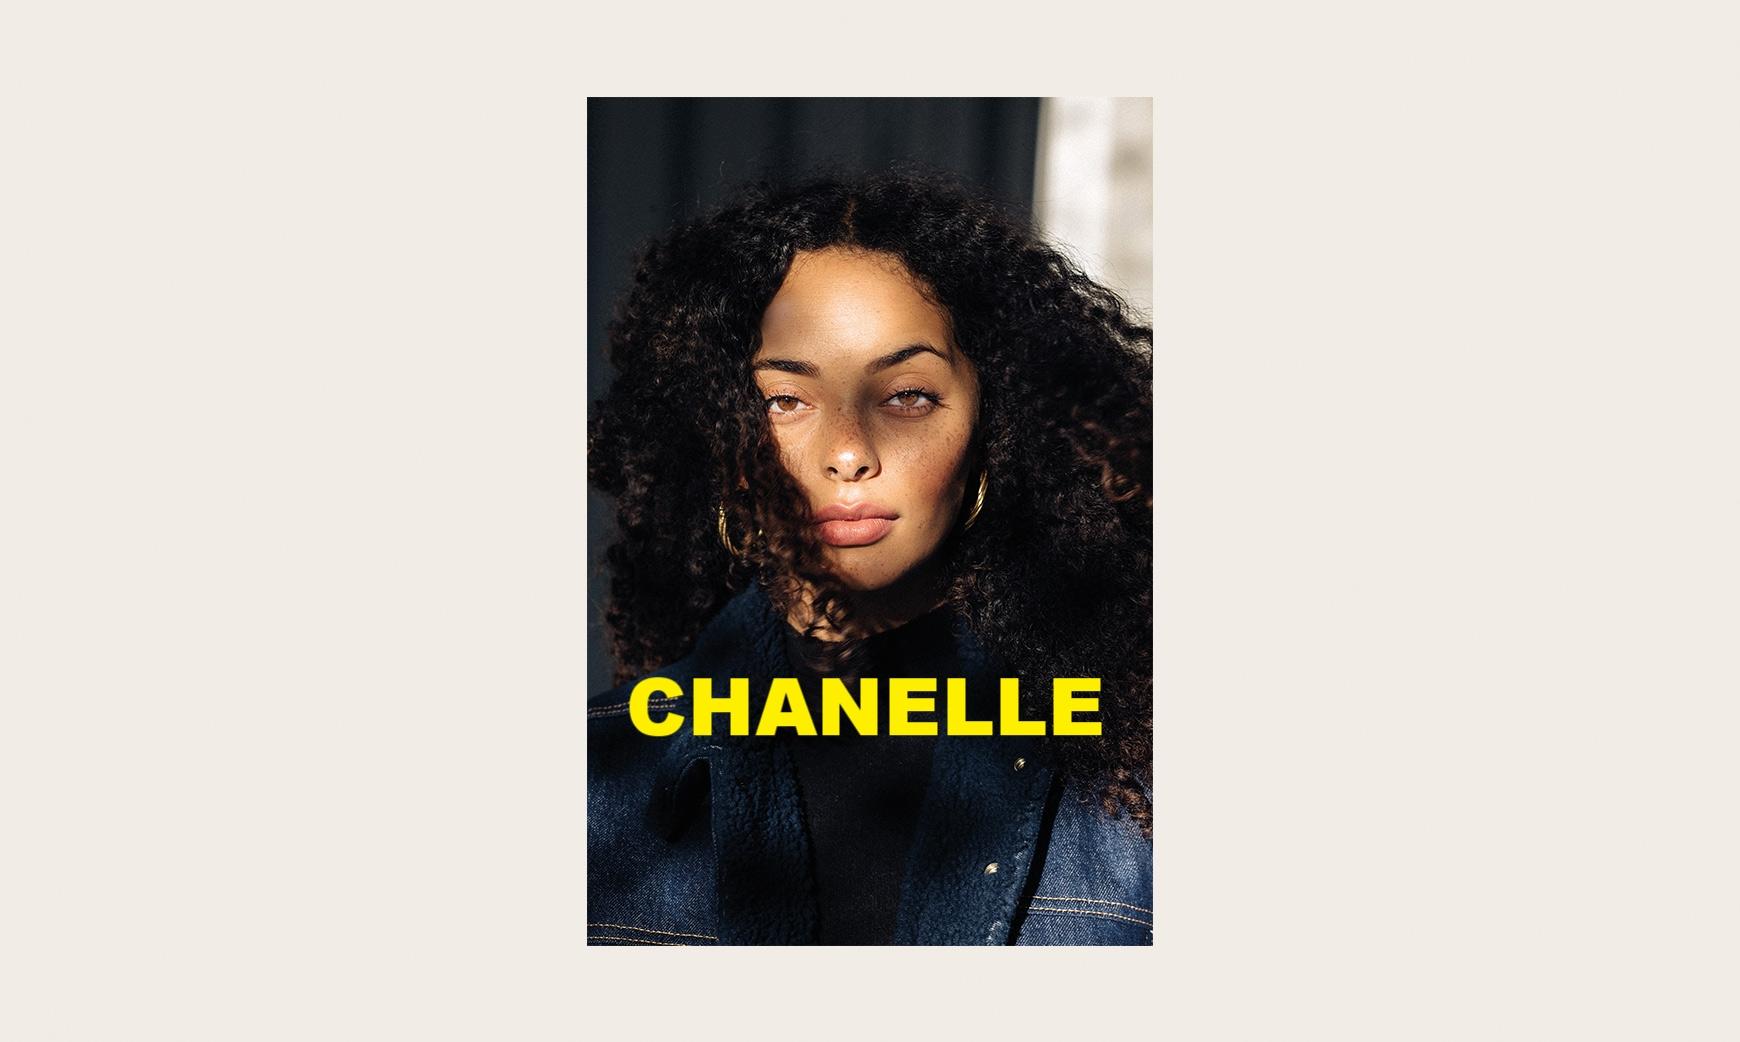 chanelle_header.jpg